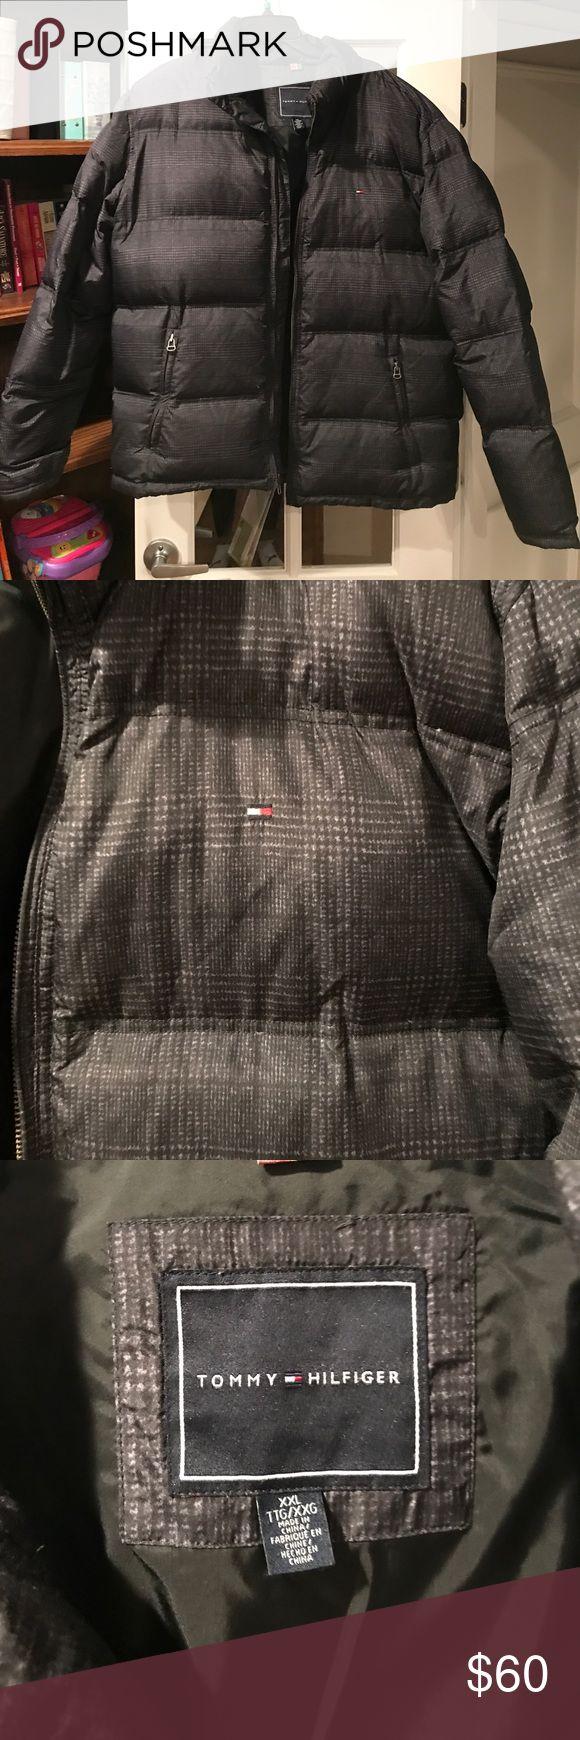 Tommy Hilfiger Men Puffer Jacket Like new, great quality warm puffer jacket Tommy Hilfiger Jackets & Coats Puffers